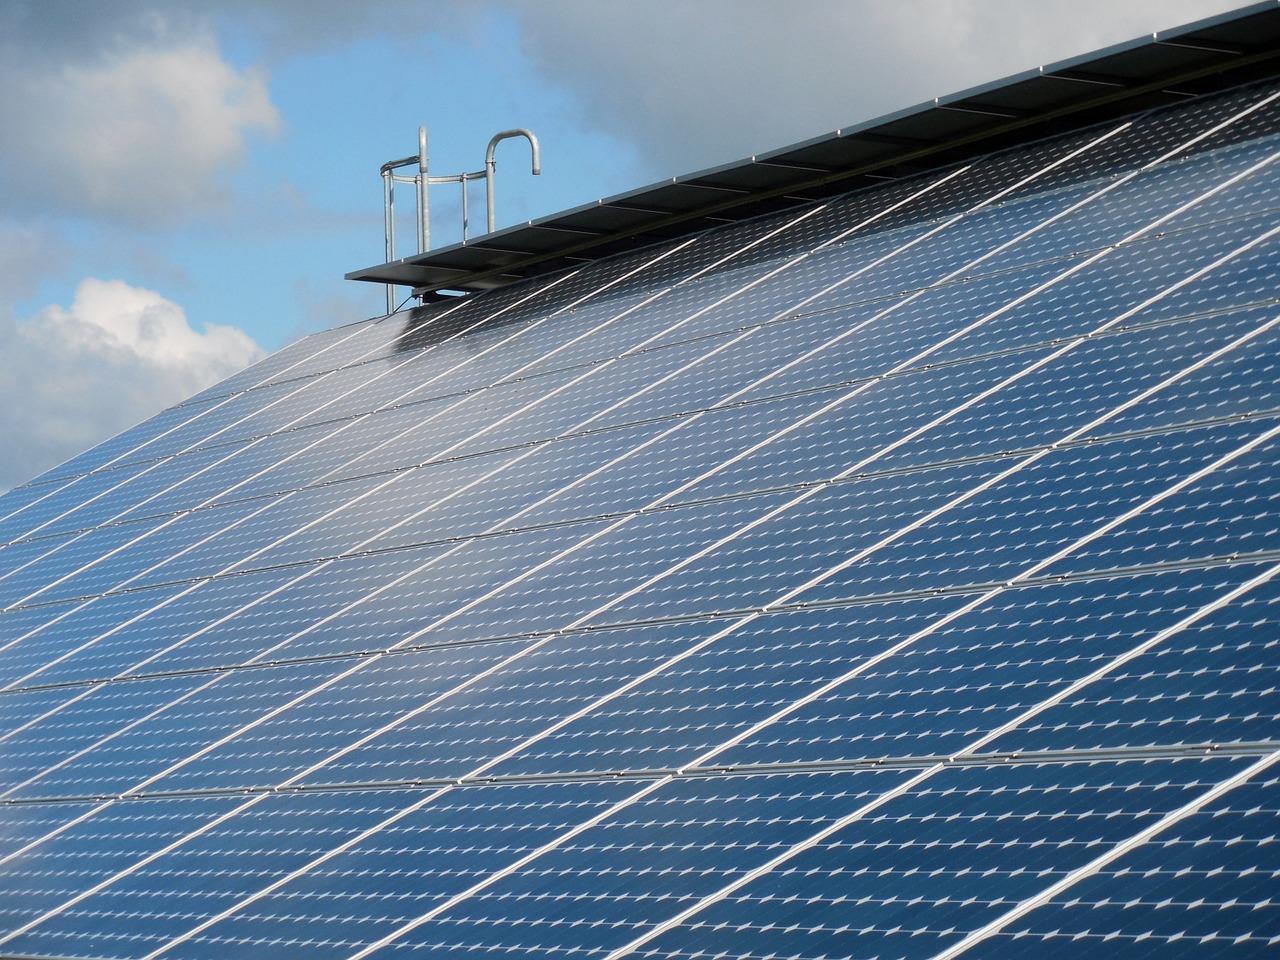 Jak uniknąć podwyżek cen prądu